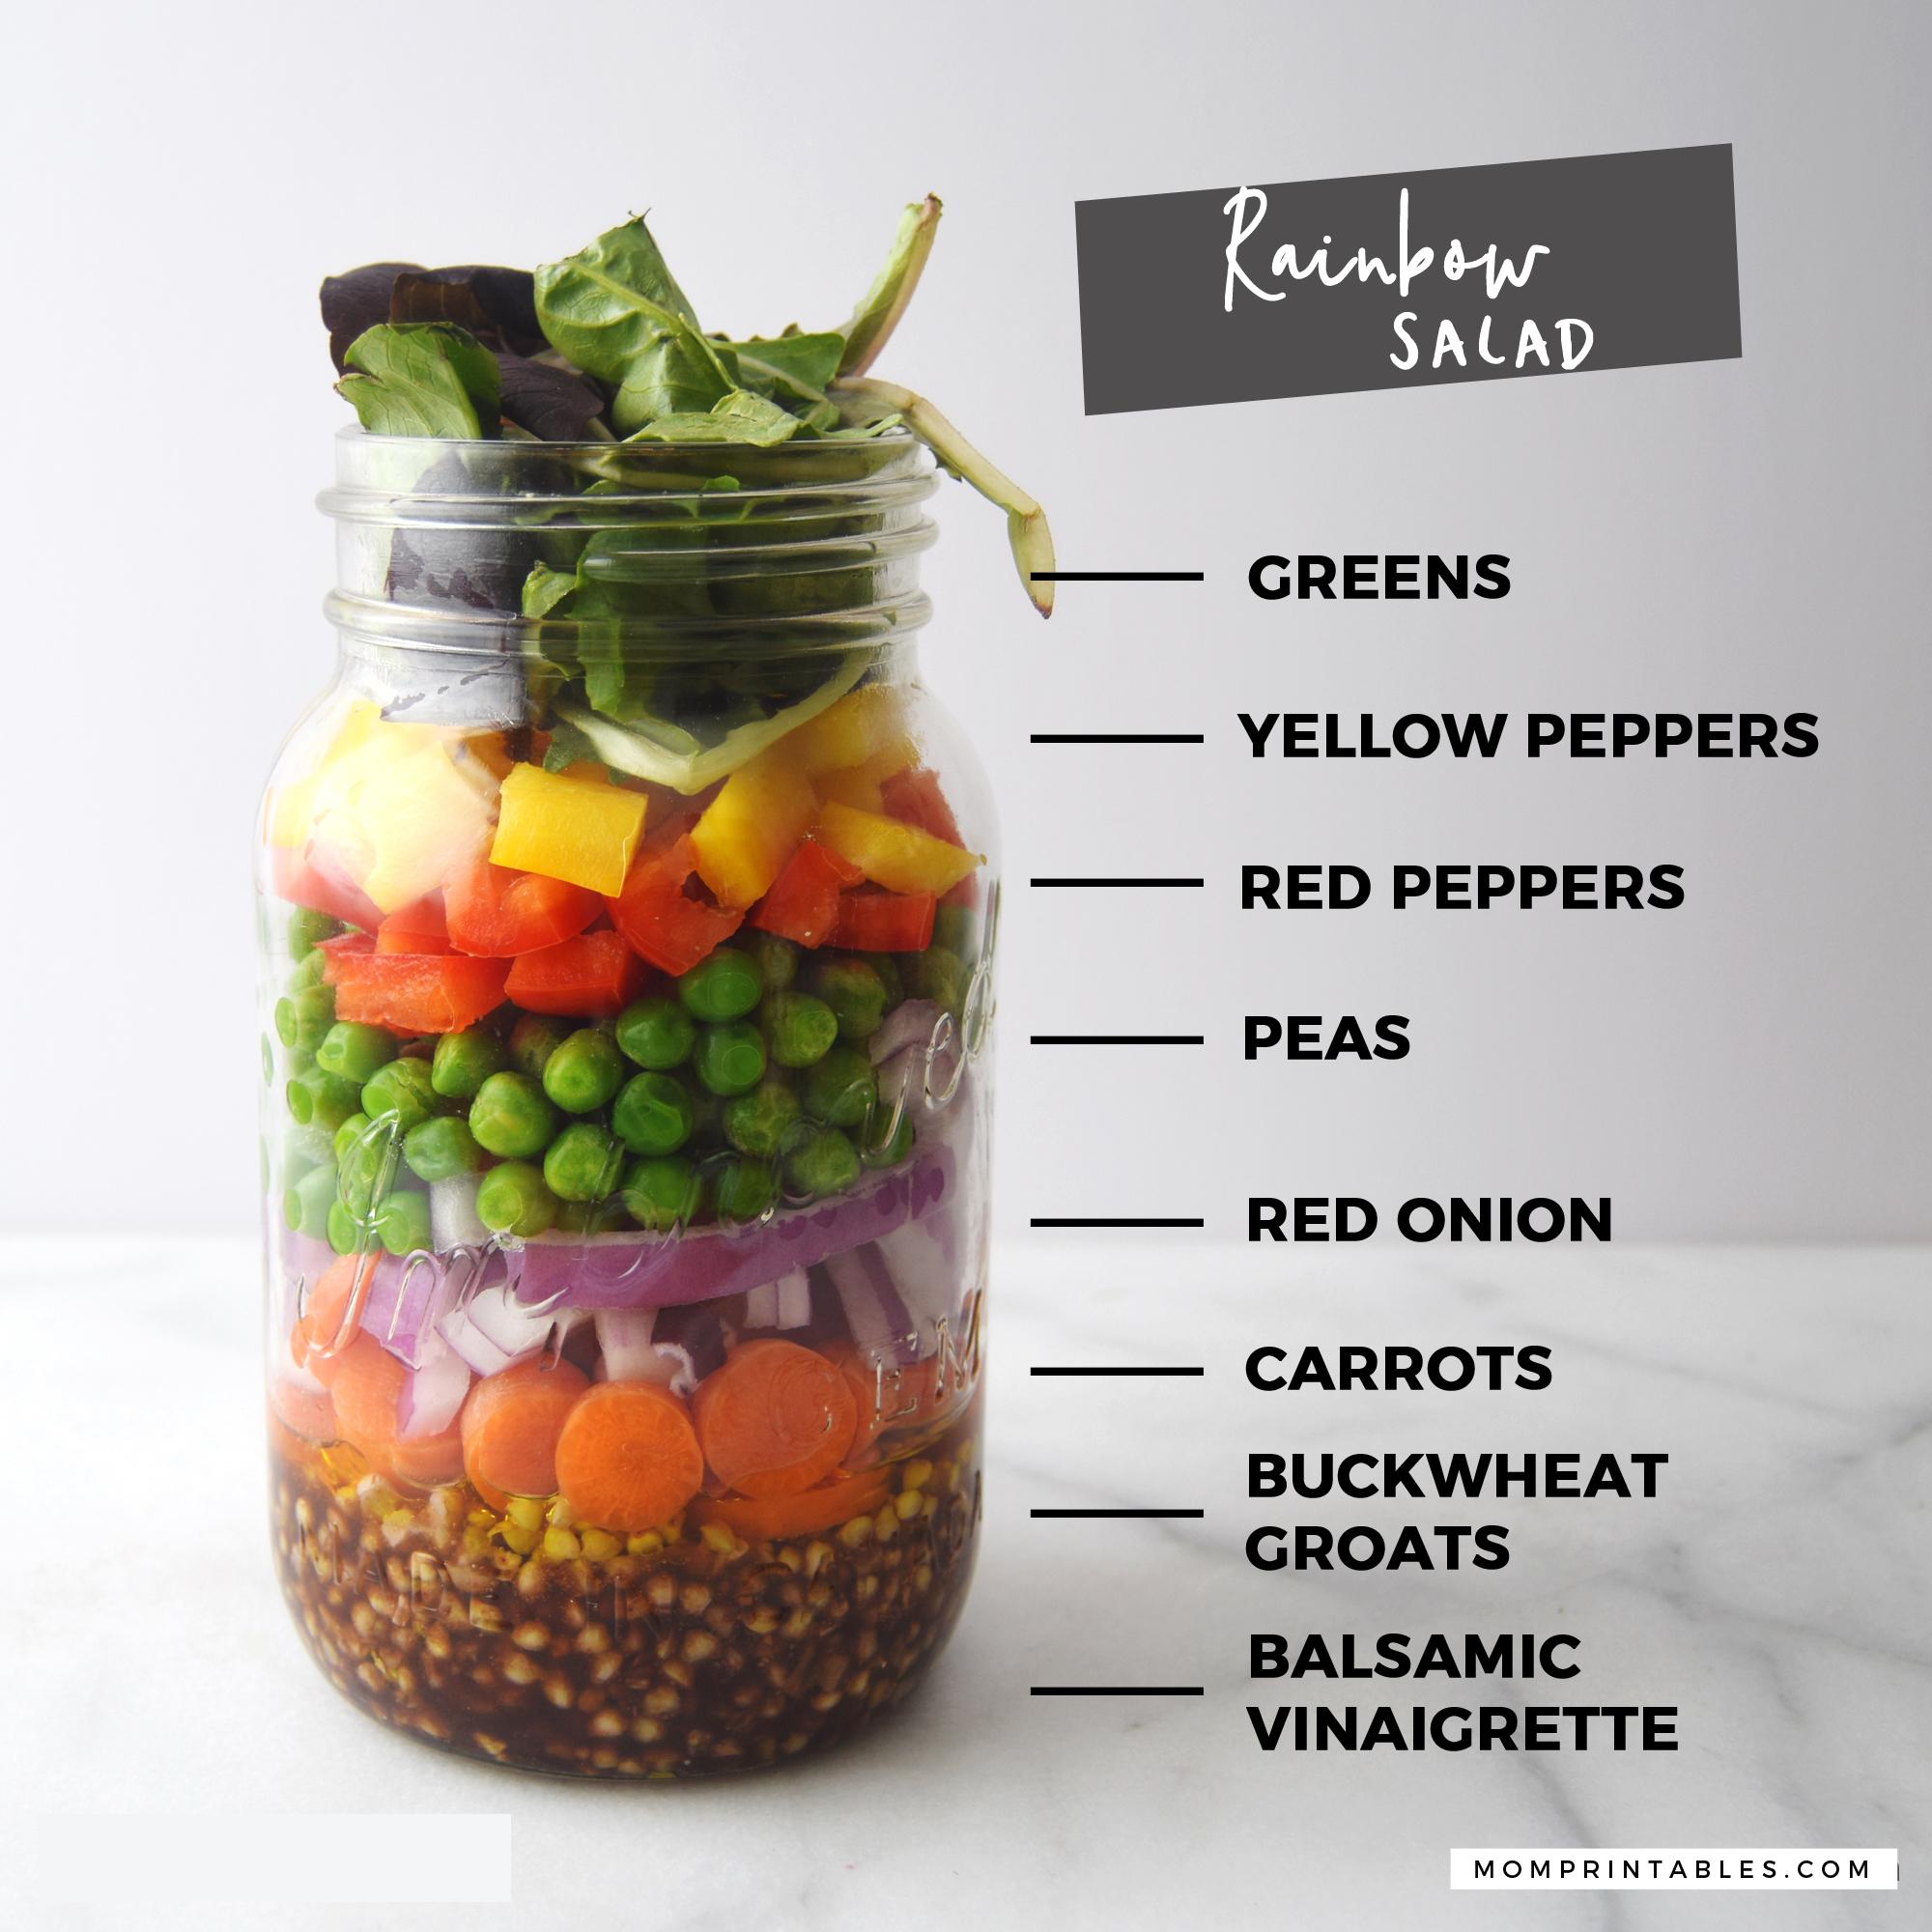 Mason Jar Salad - Rainbow Salad